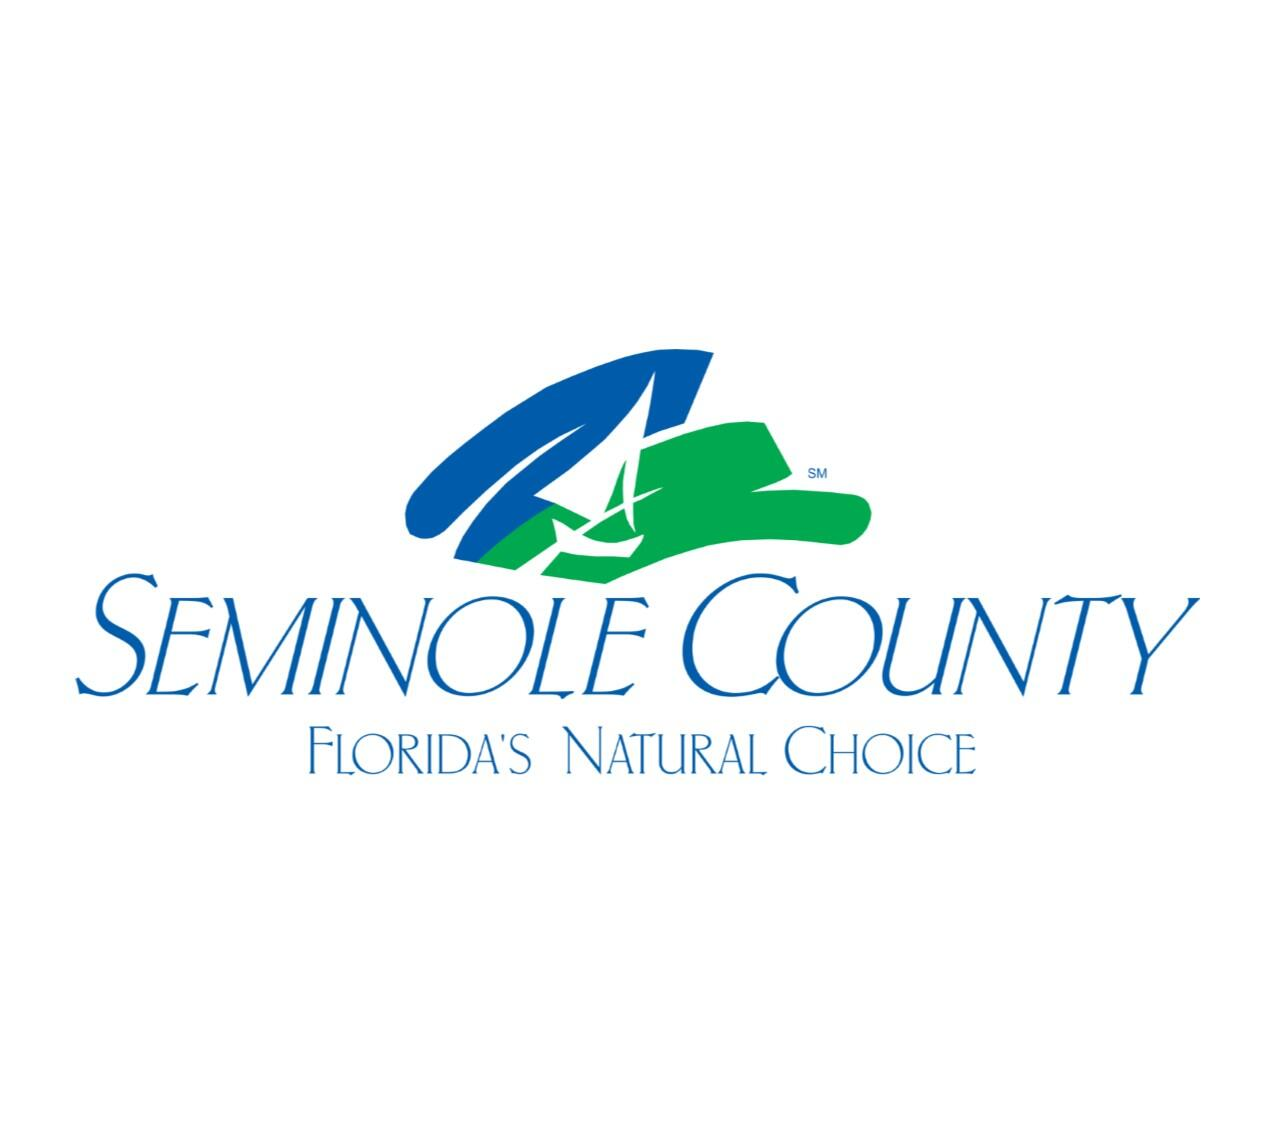 Seminole County - 1395 updates &mdash